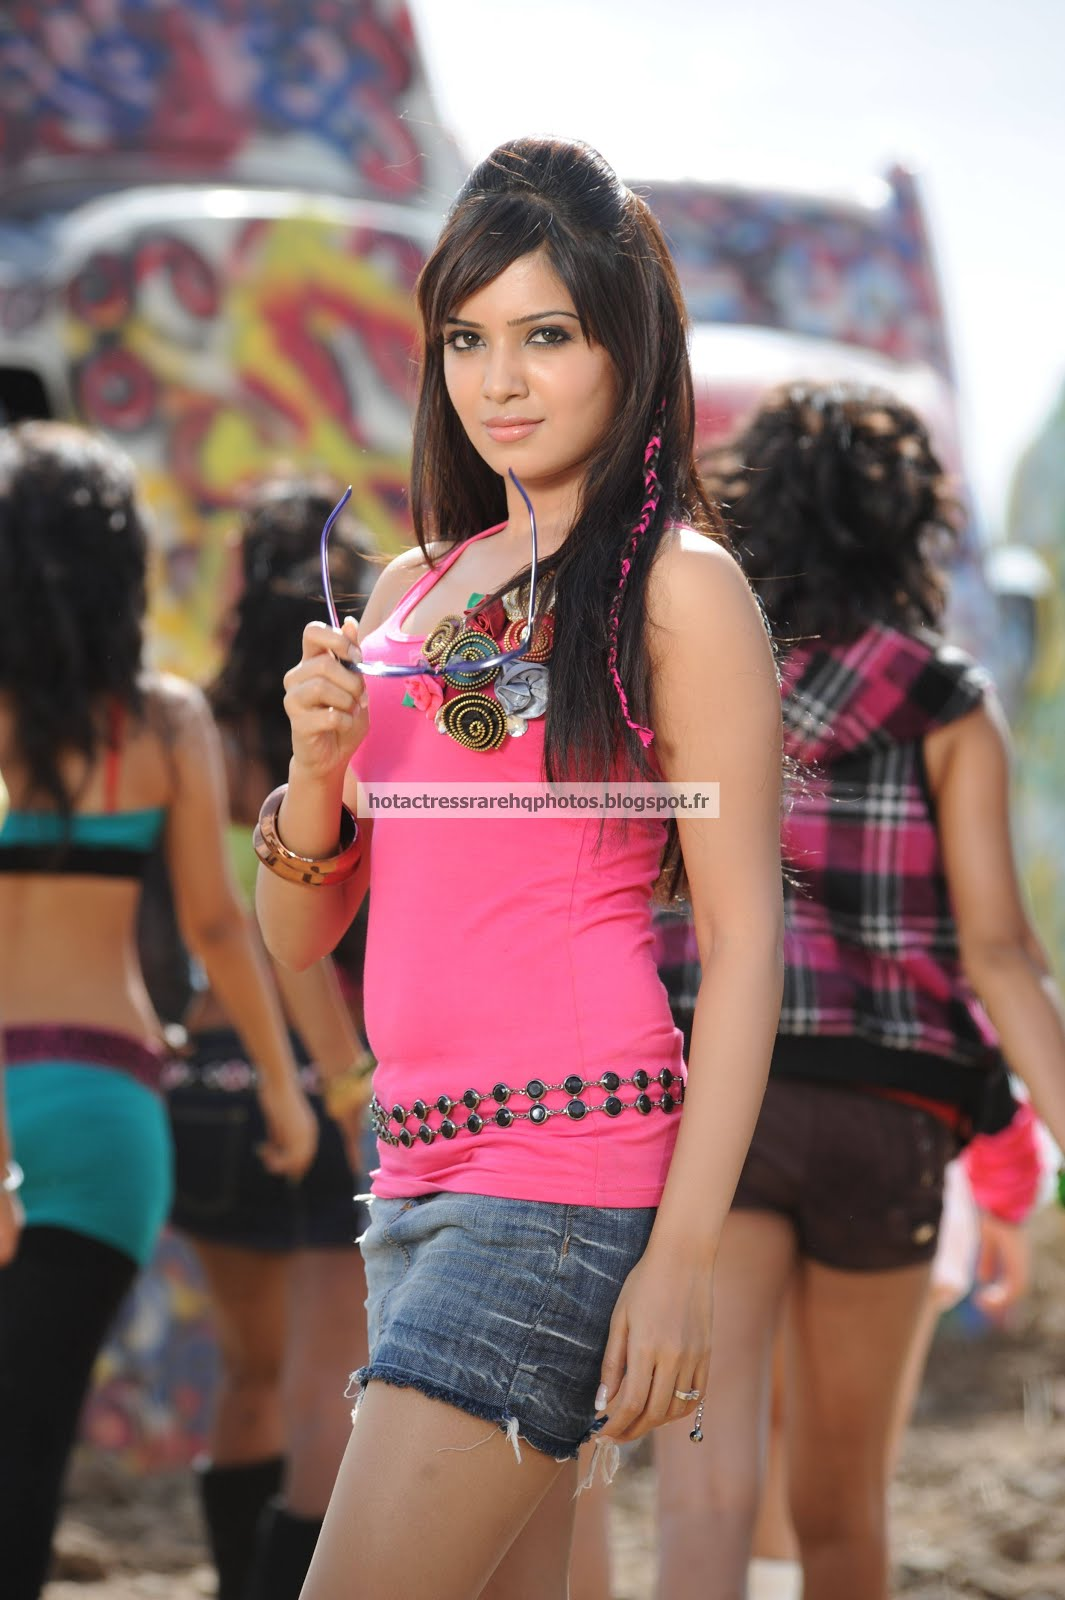 Trisha Hd Cute Wallpapers Hot Indian Actress Rare Hq Photos Actress Samantha Ruth